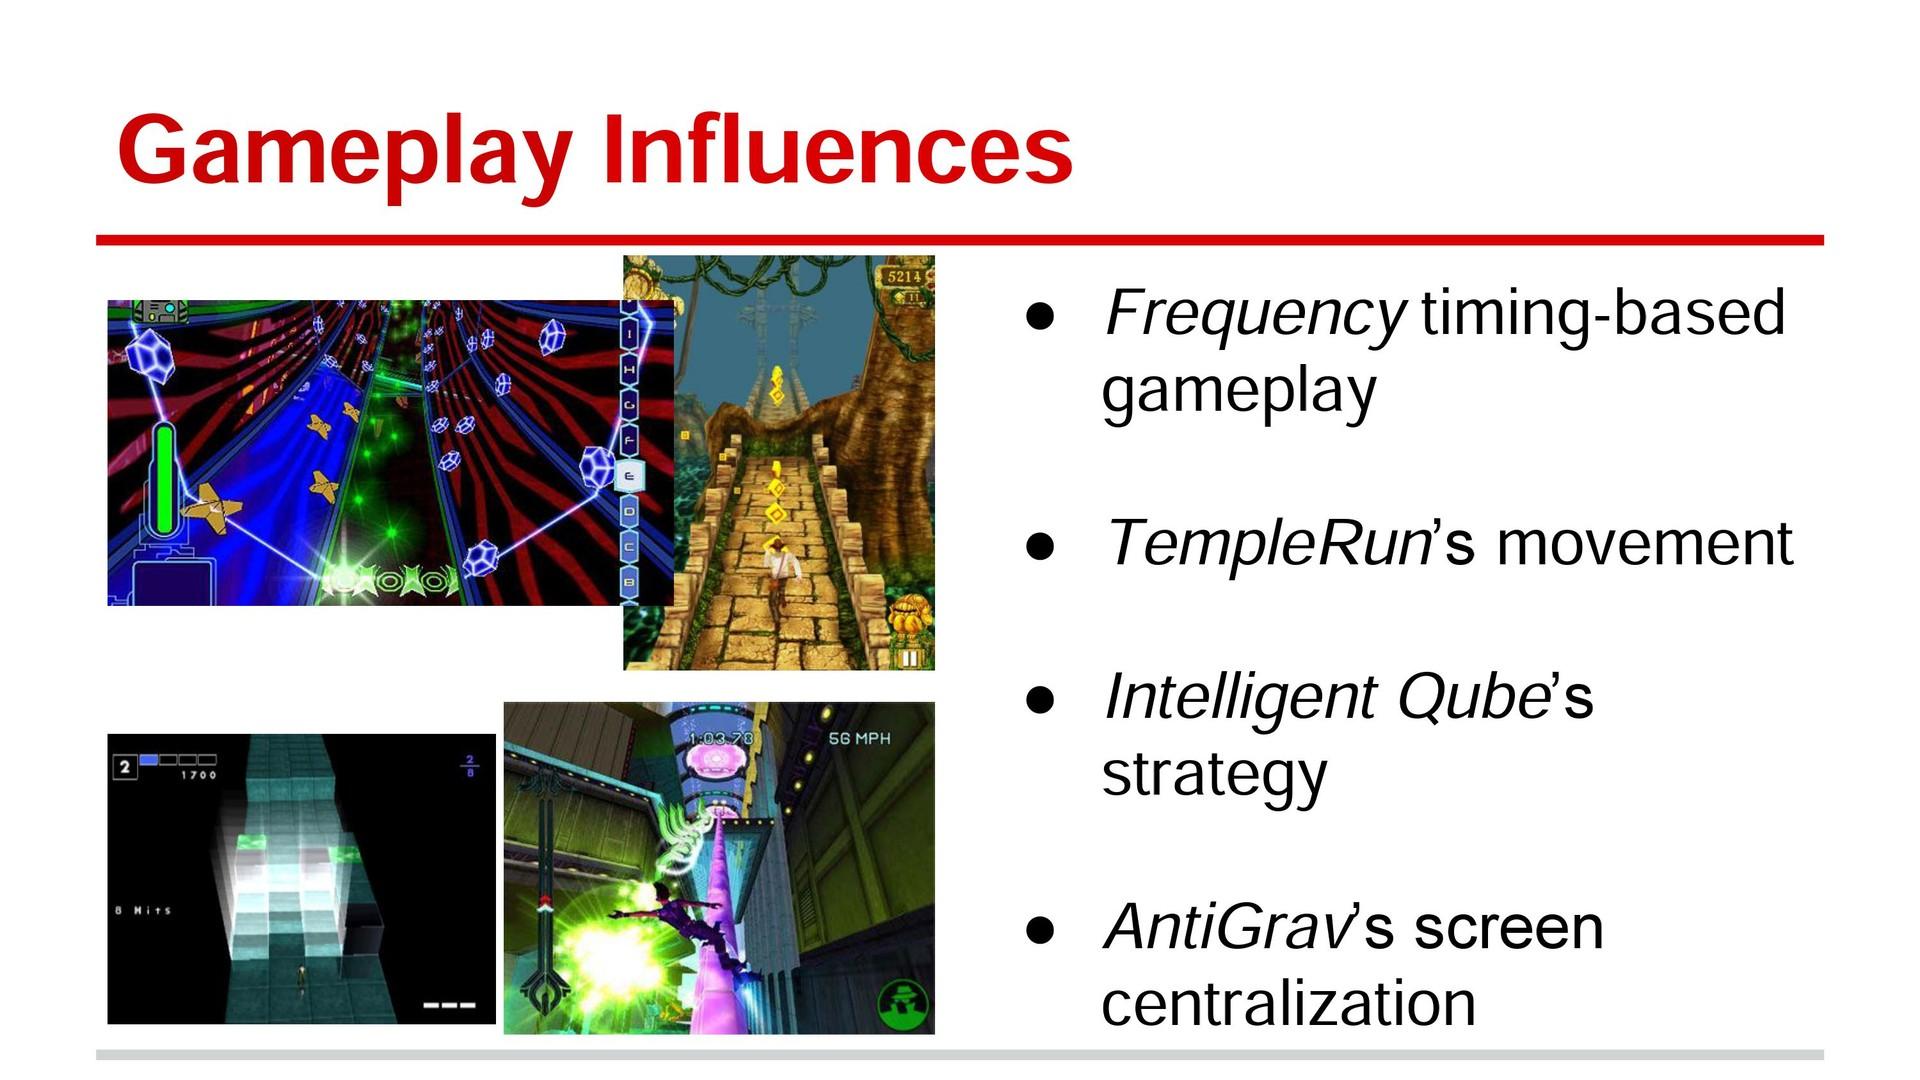 Gameplay Influences Slide